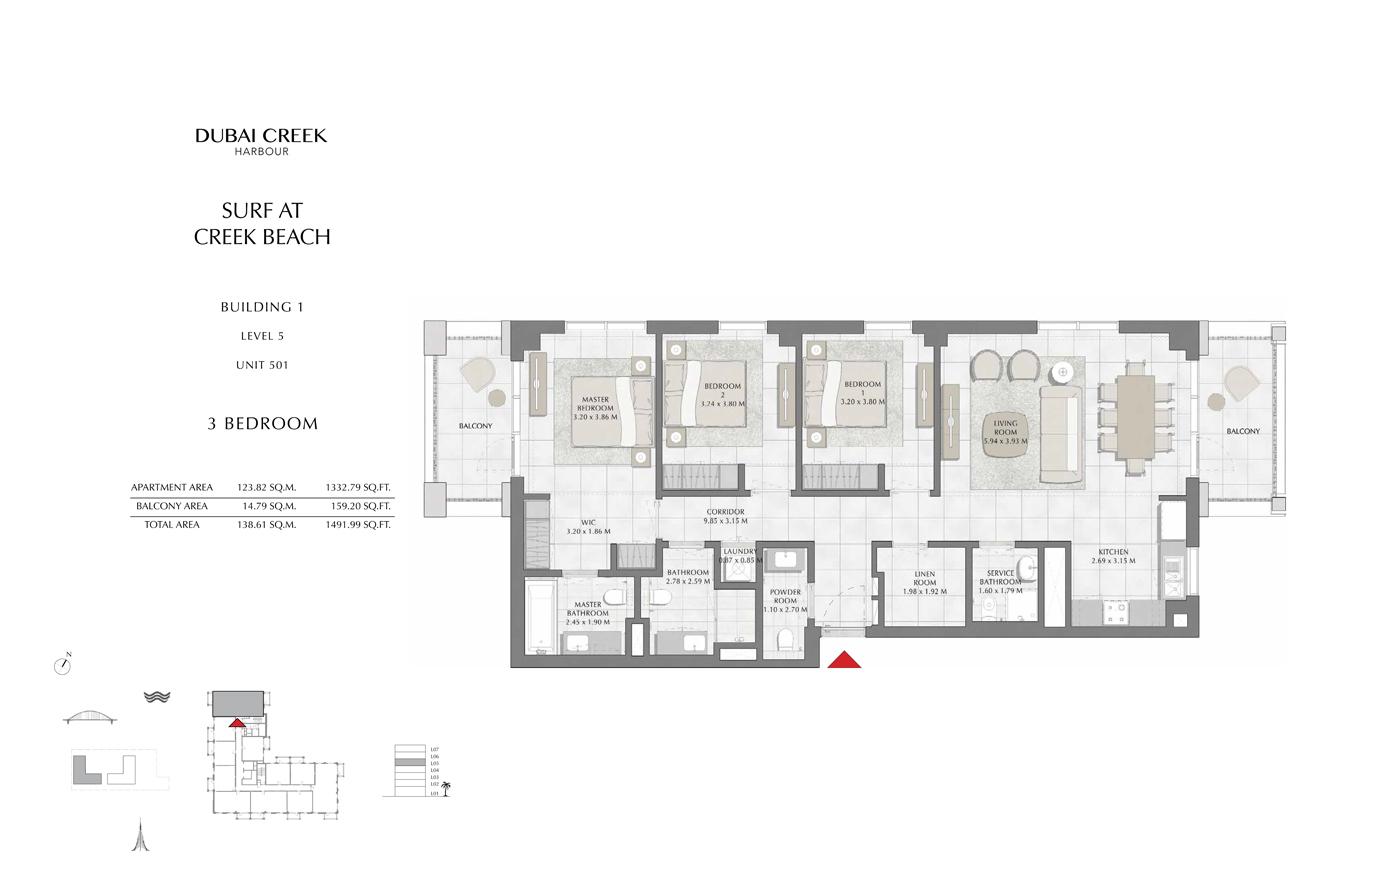 Building 1, 3 Bedroom, Level 5, Size 1491 Sq Ft